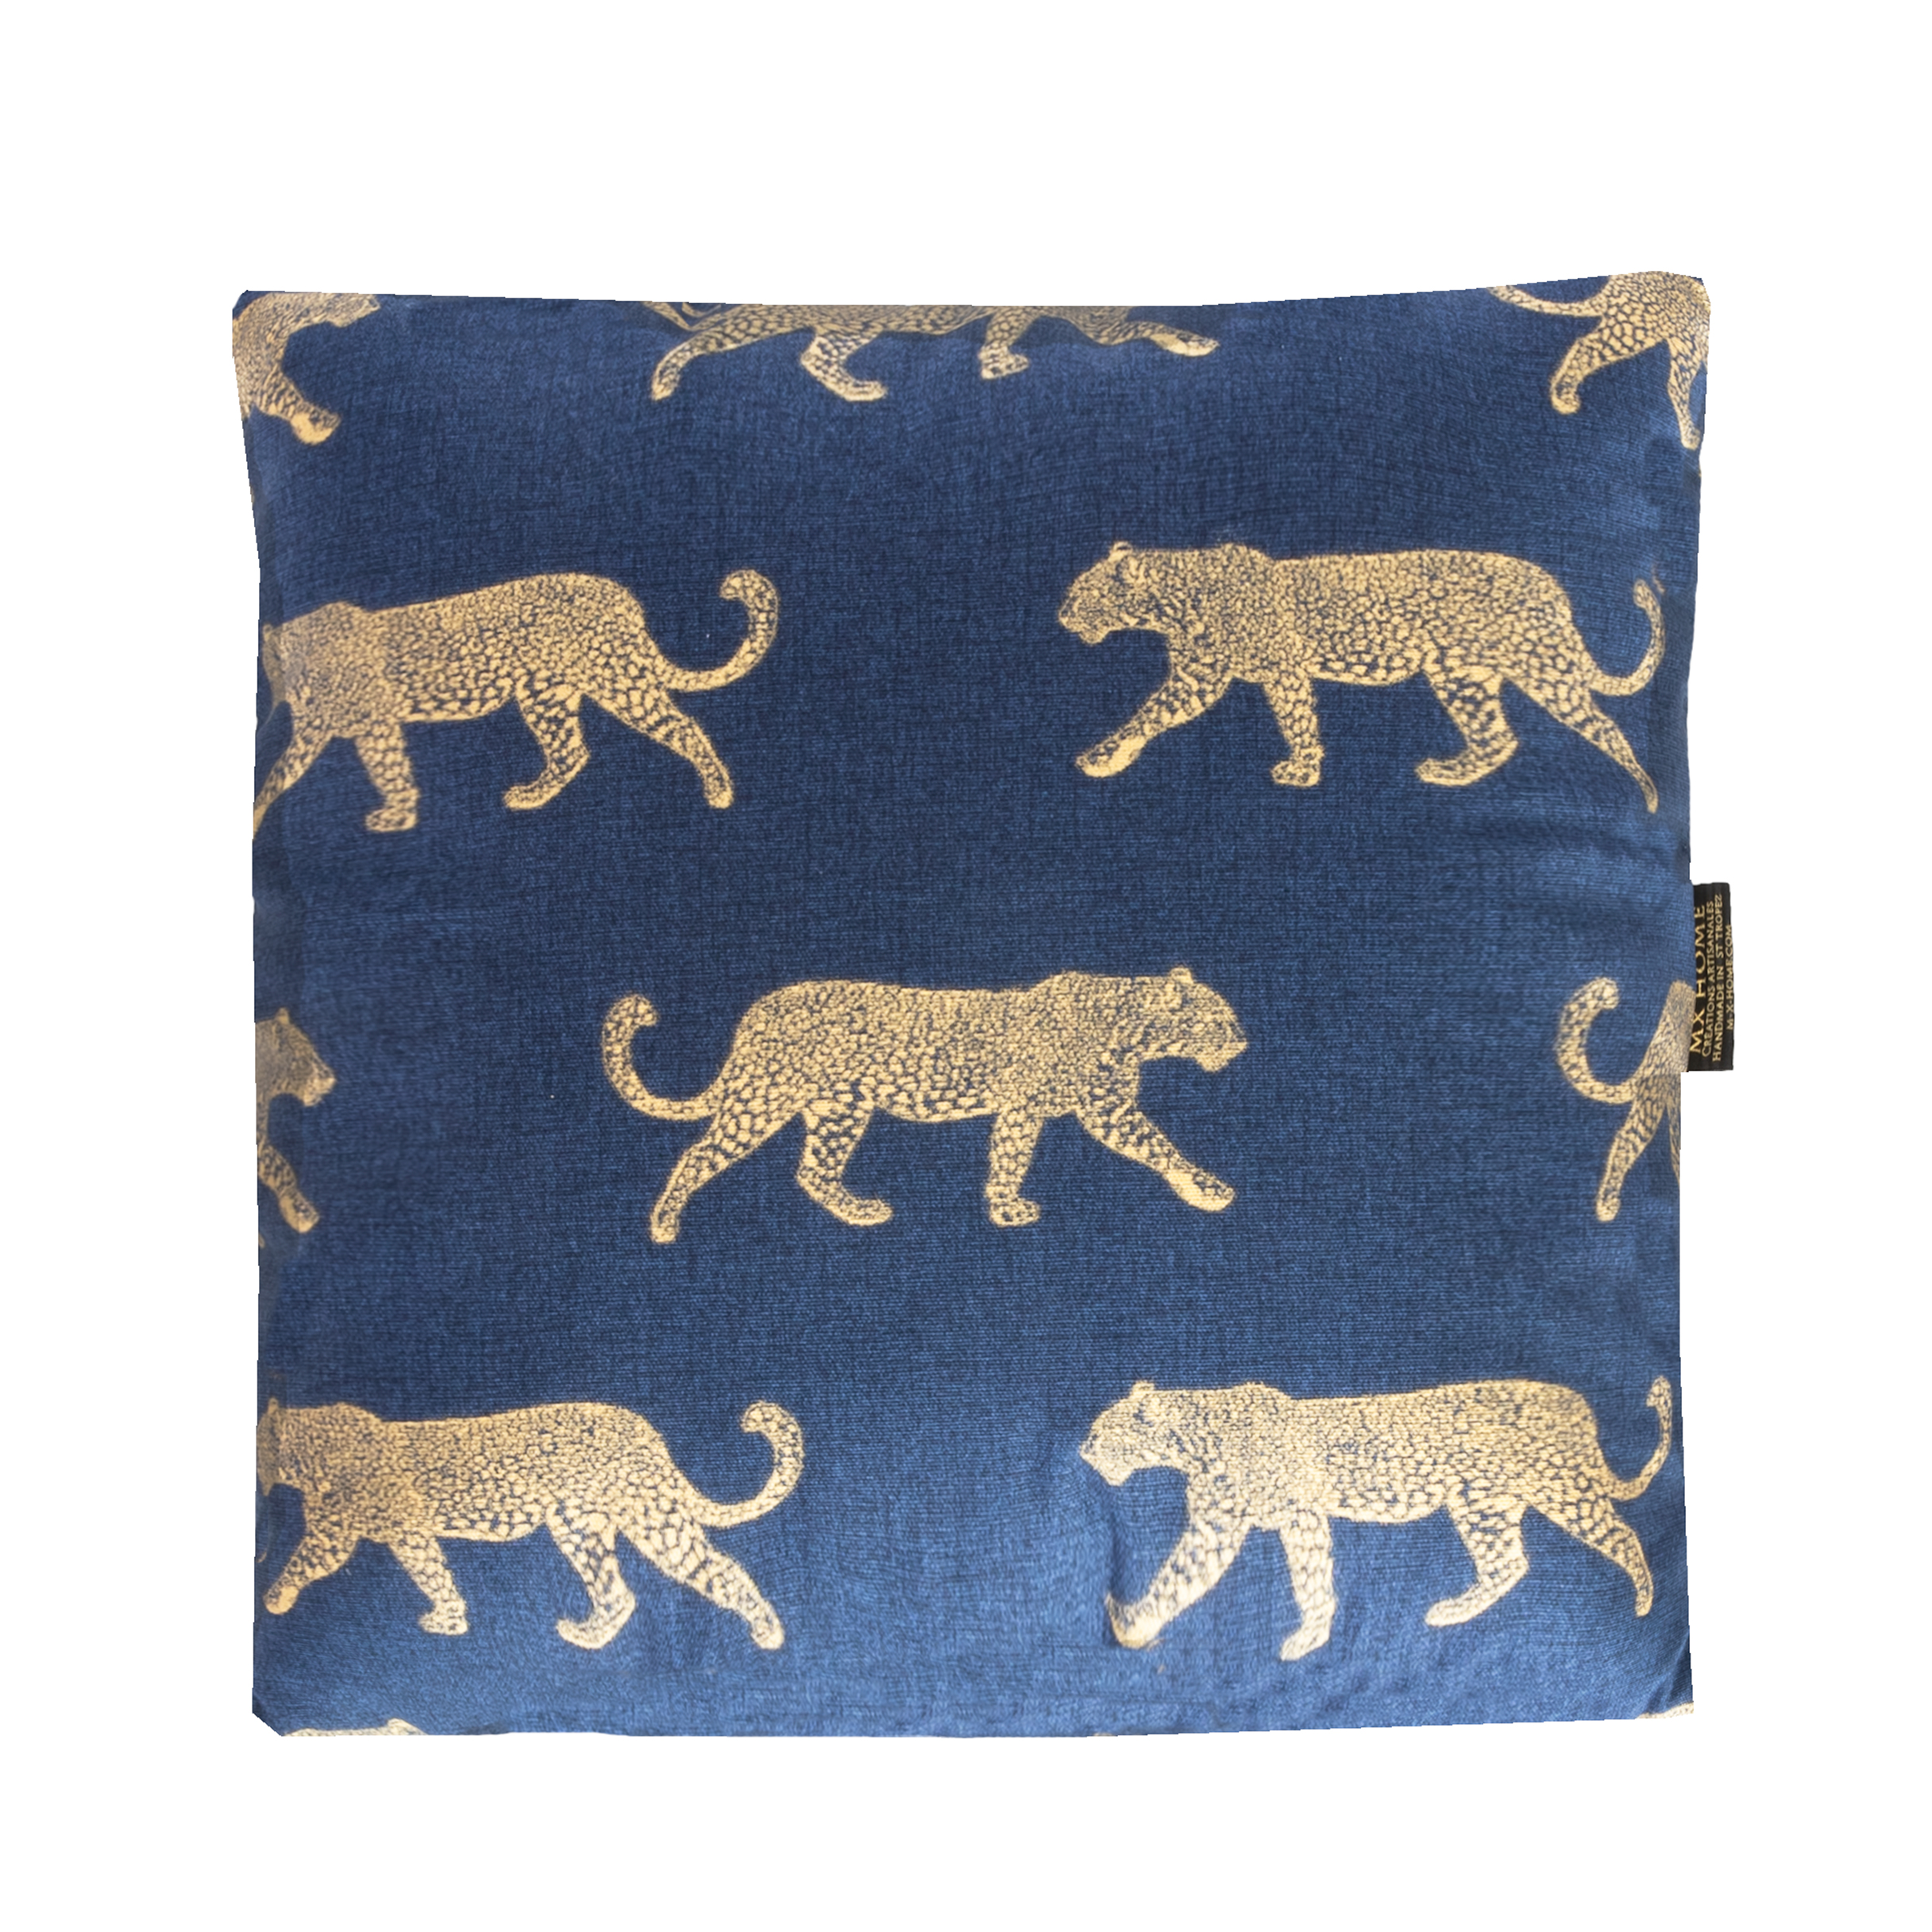 Coussin en coton bleu cyan motif tigre or